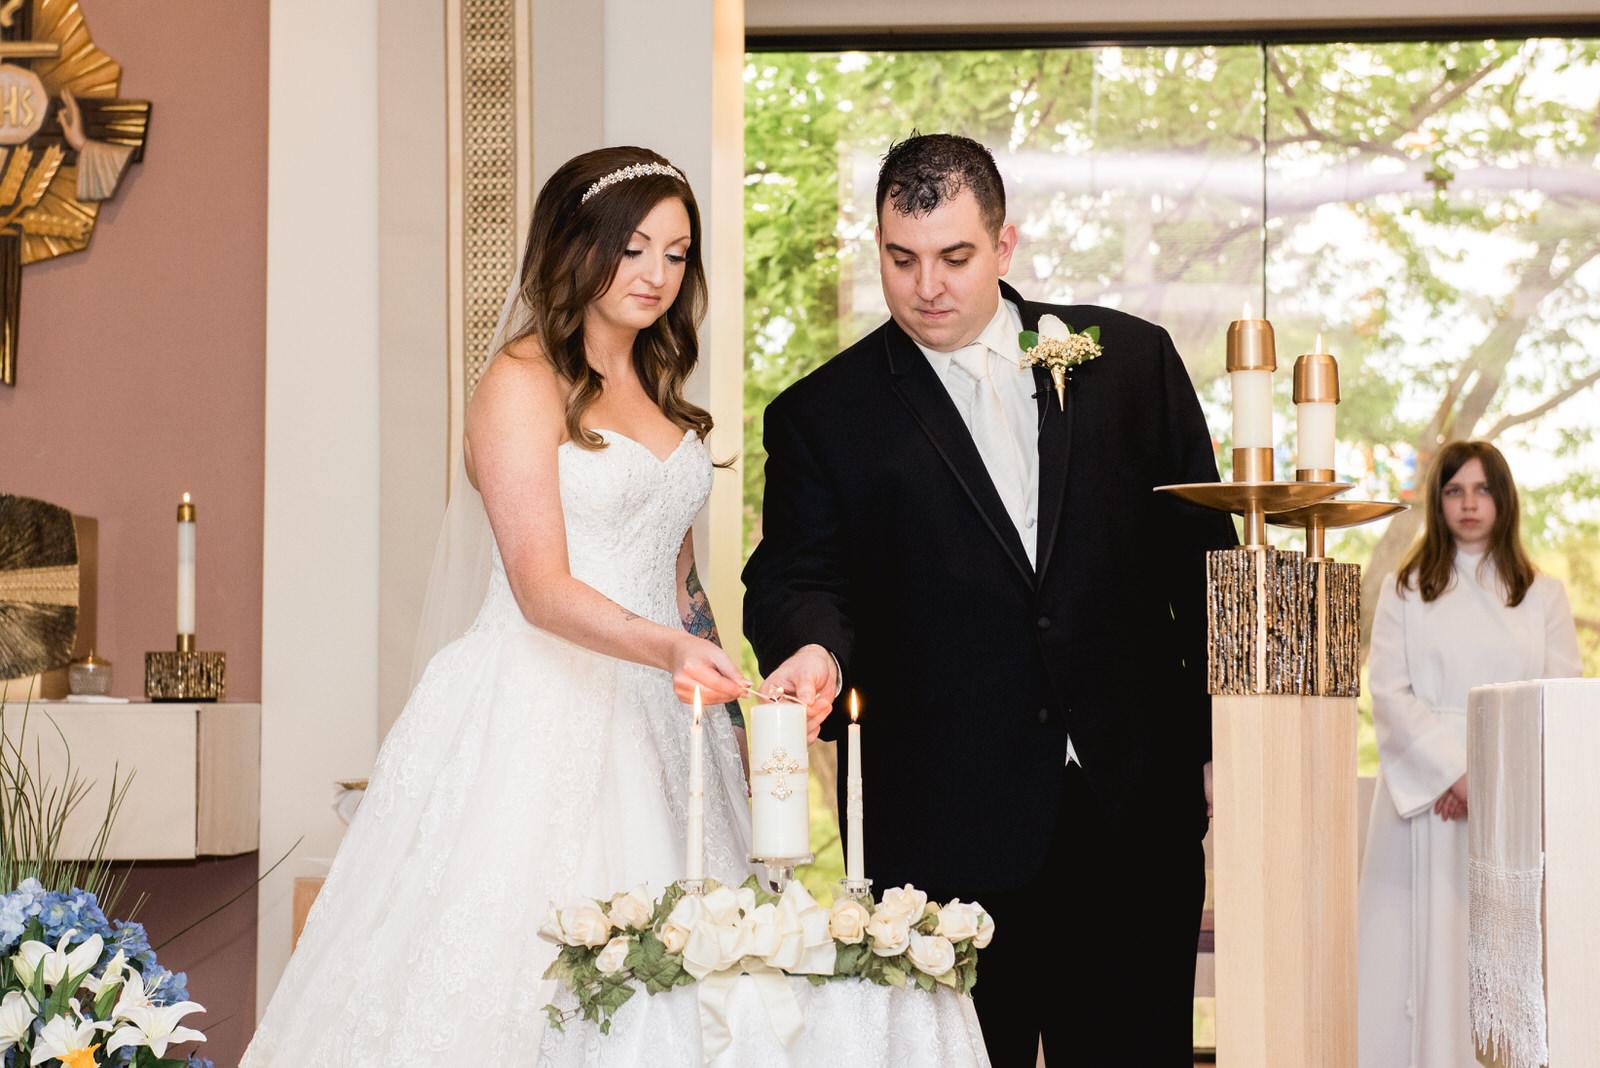 Laube_Banquet_Hall__Wedding_Photos_048.jpg